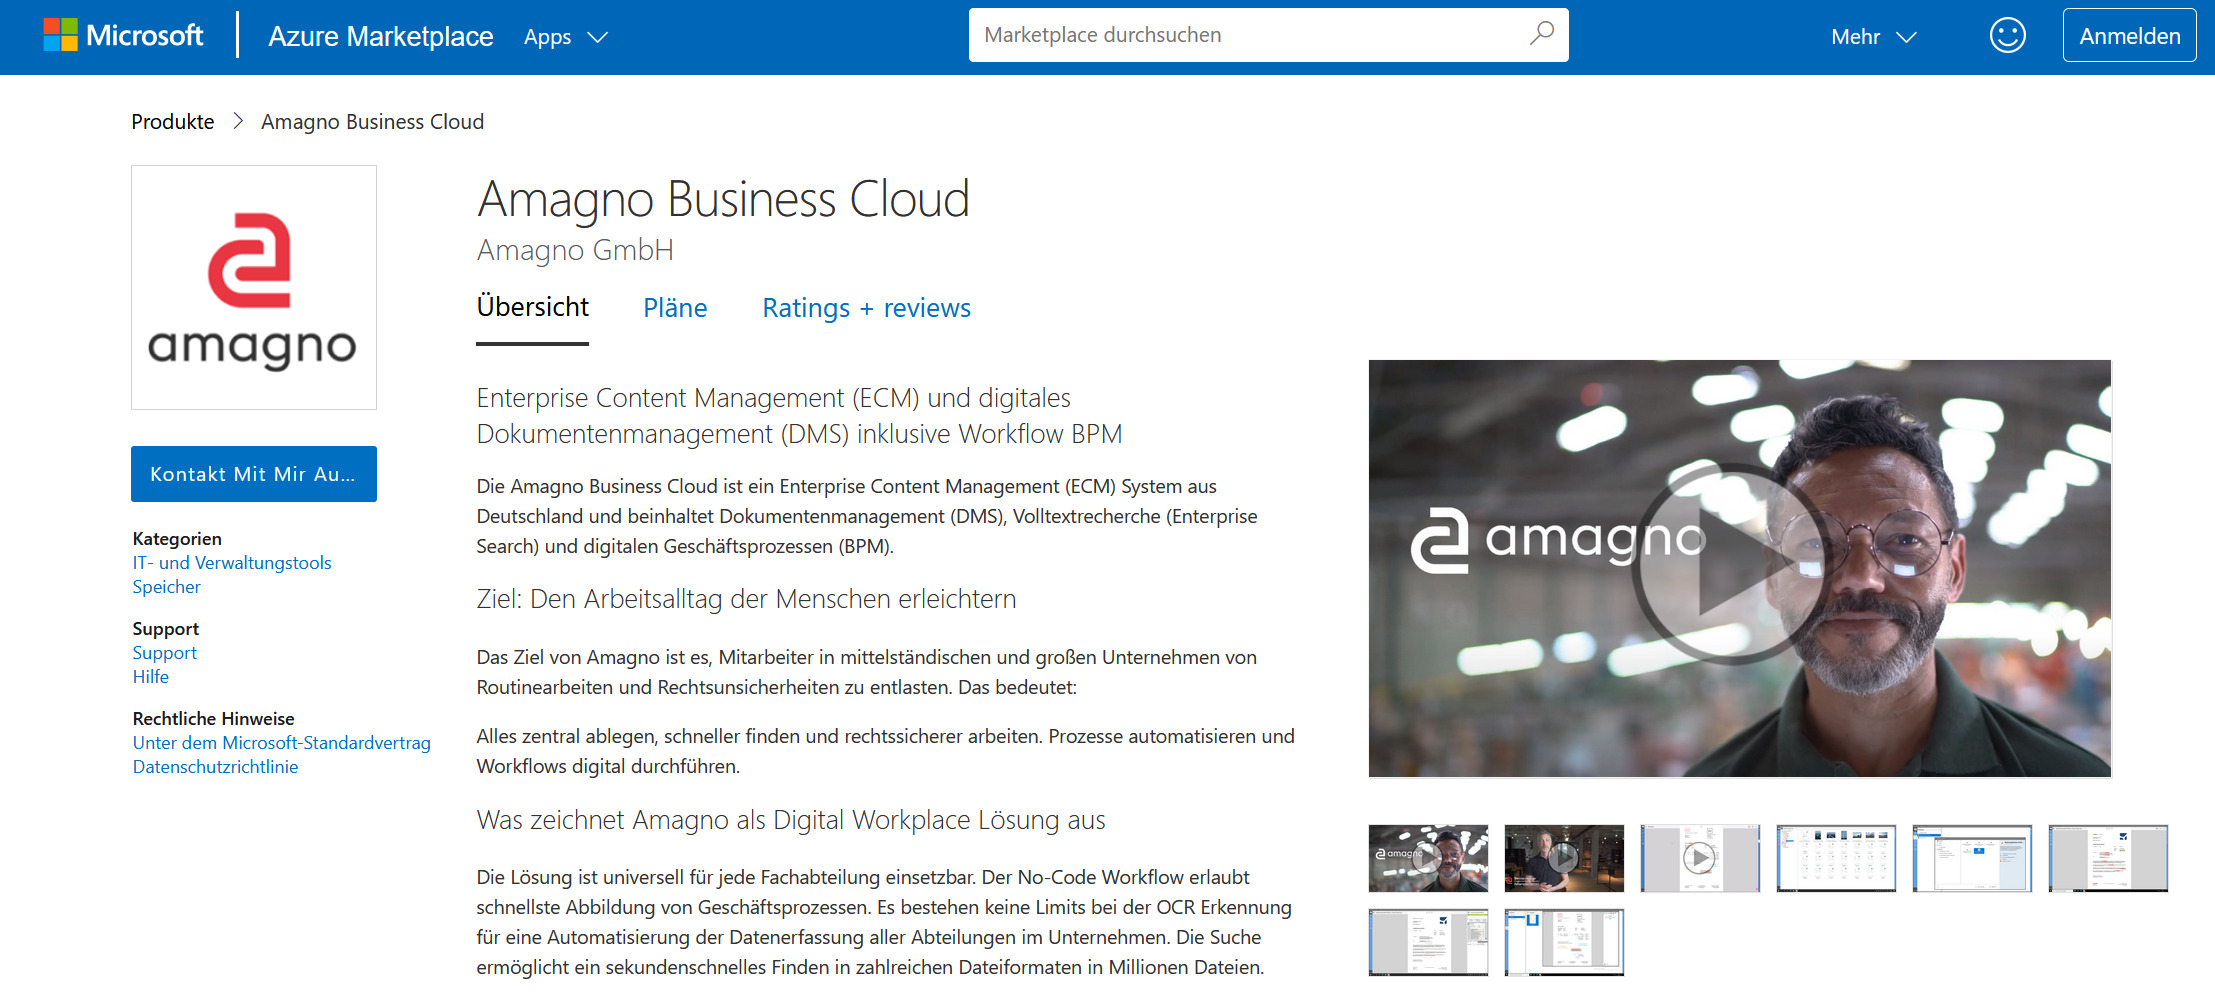 Amagno Business Cloud jetzt im Microsoft Marketplace erhältlich